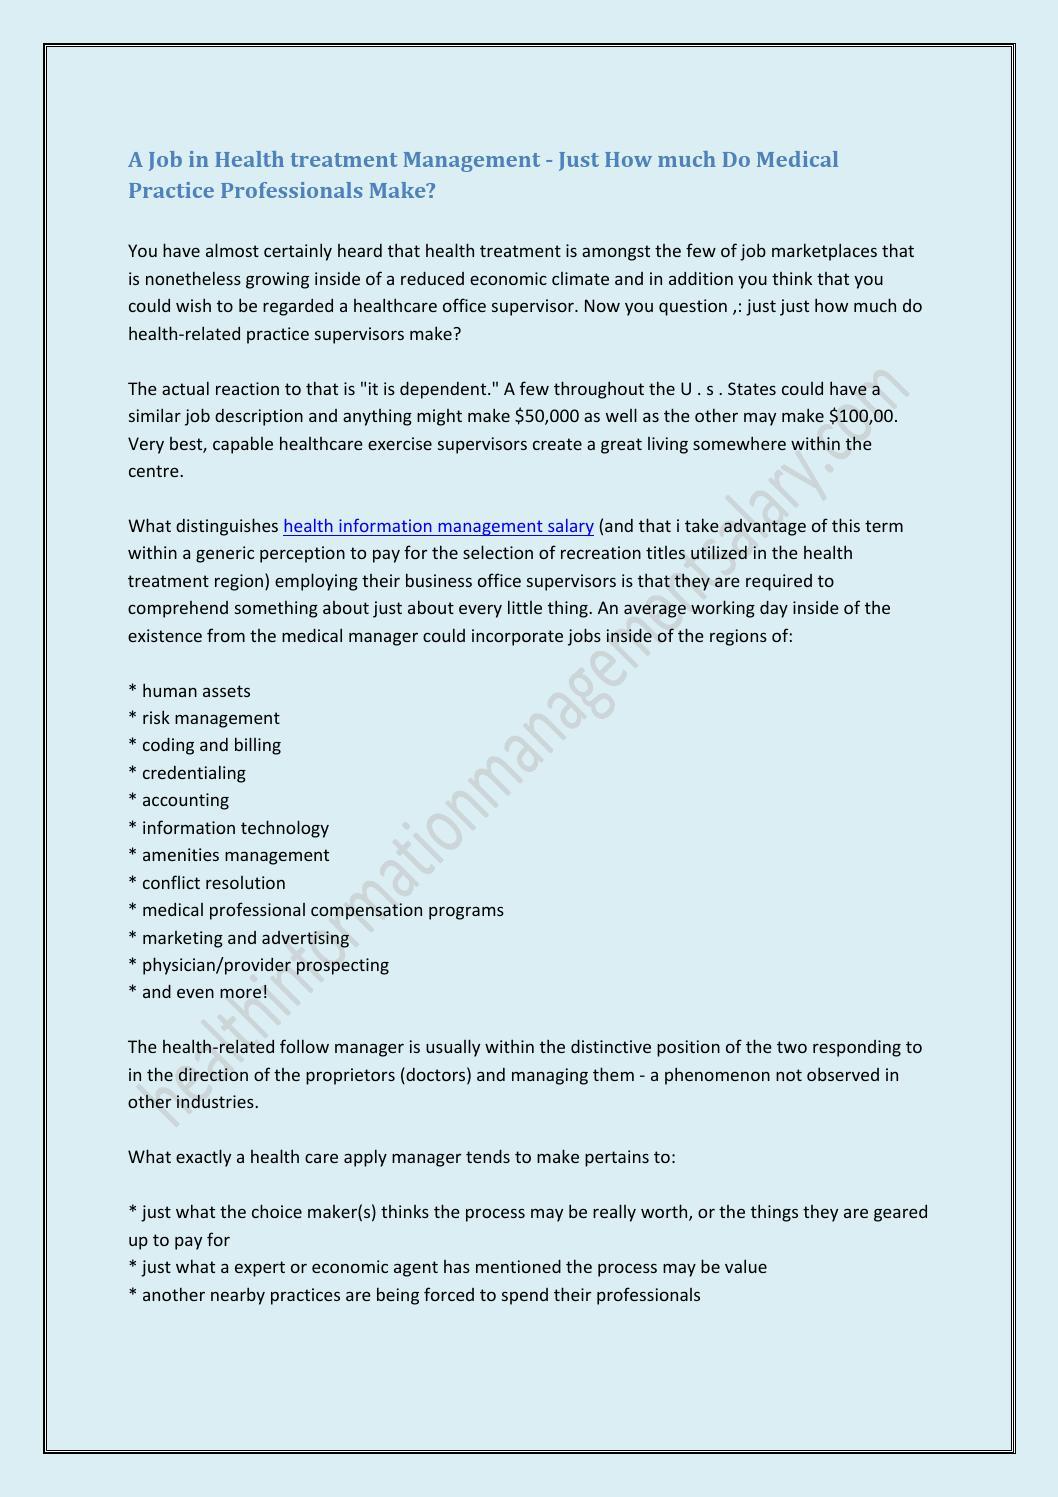 Health Information Management Salary By Jaktionhayder Issuu